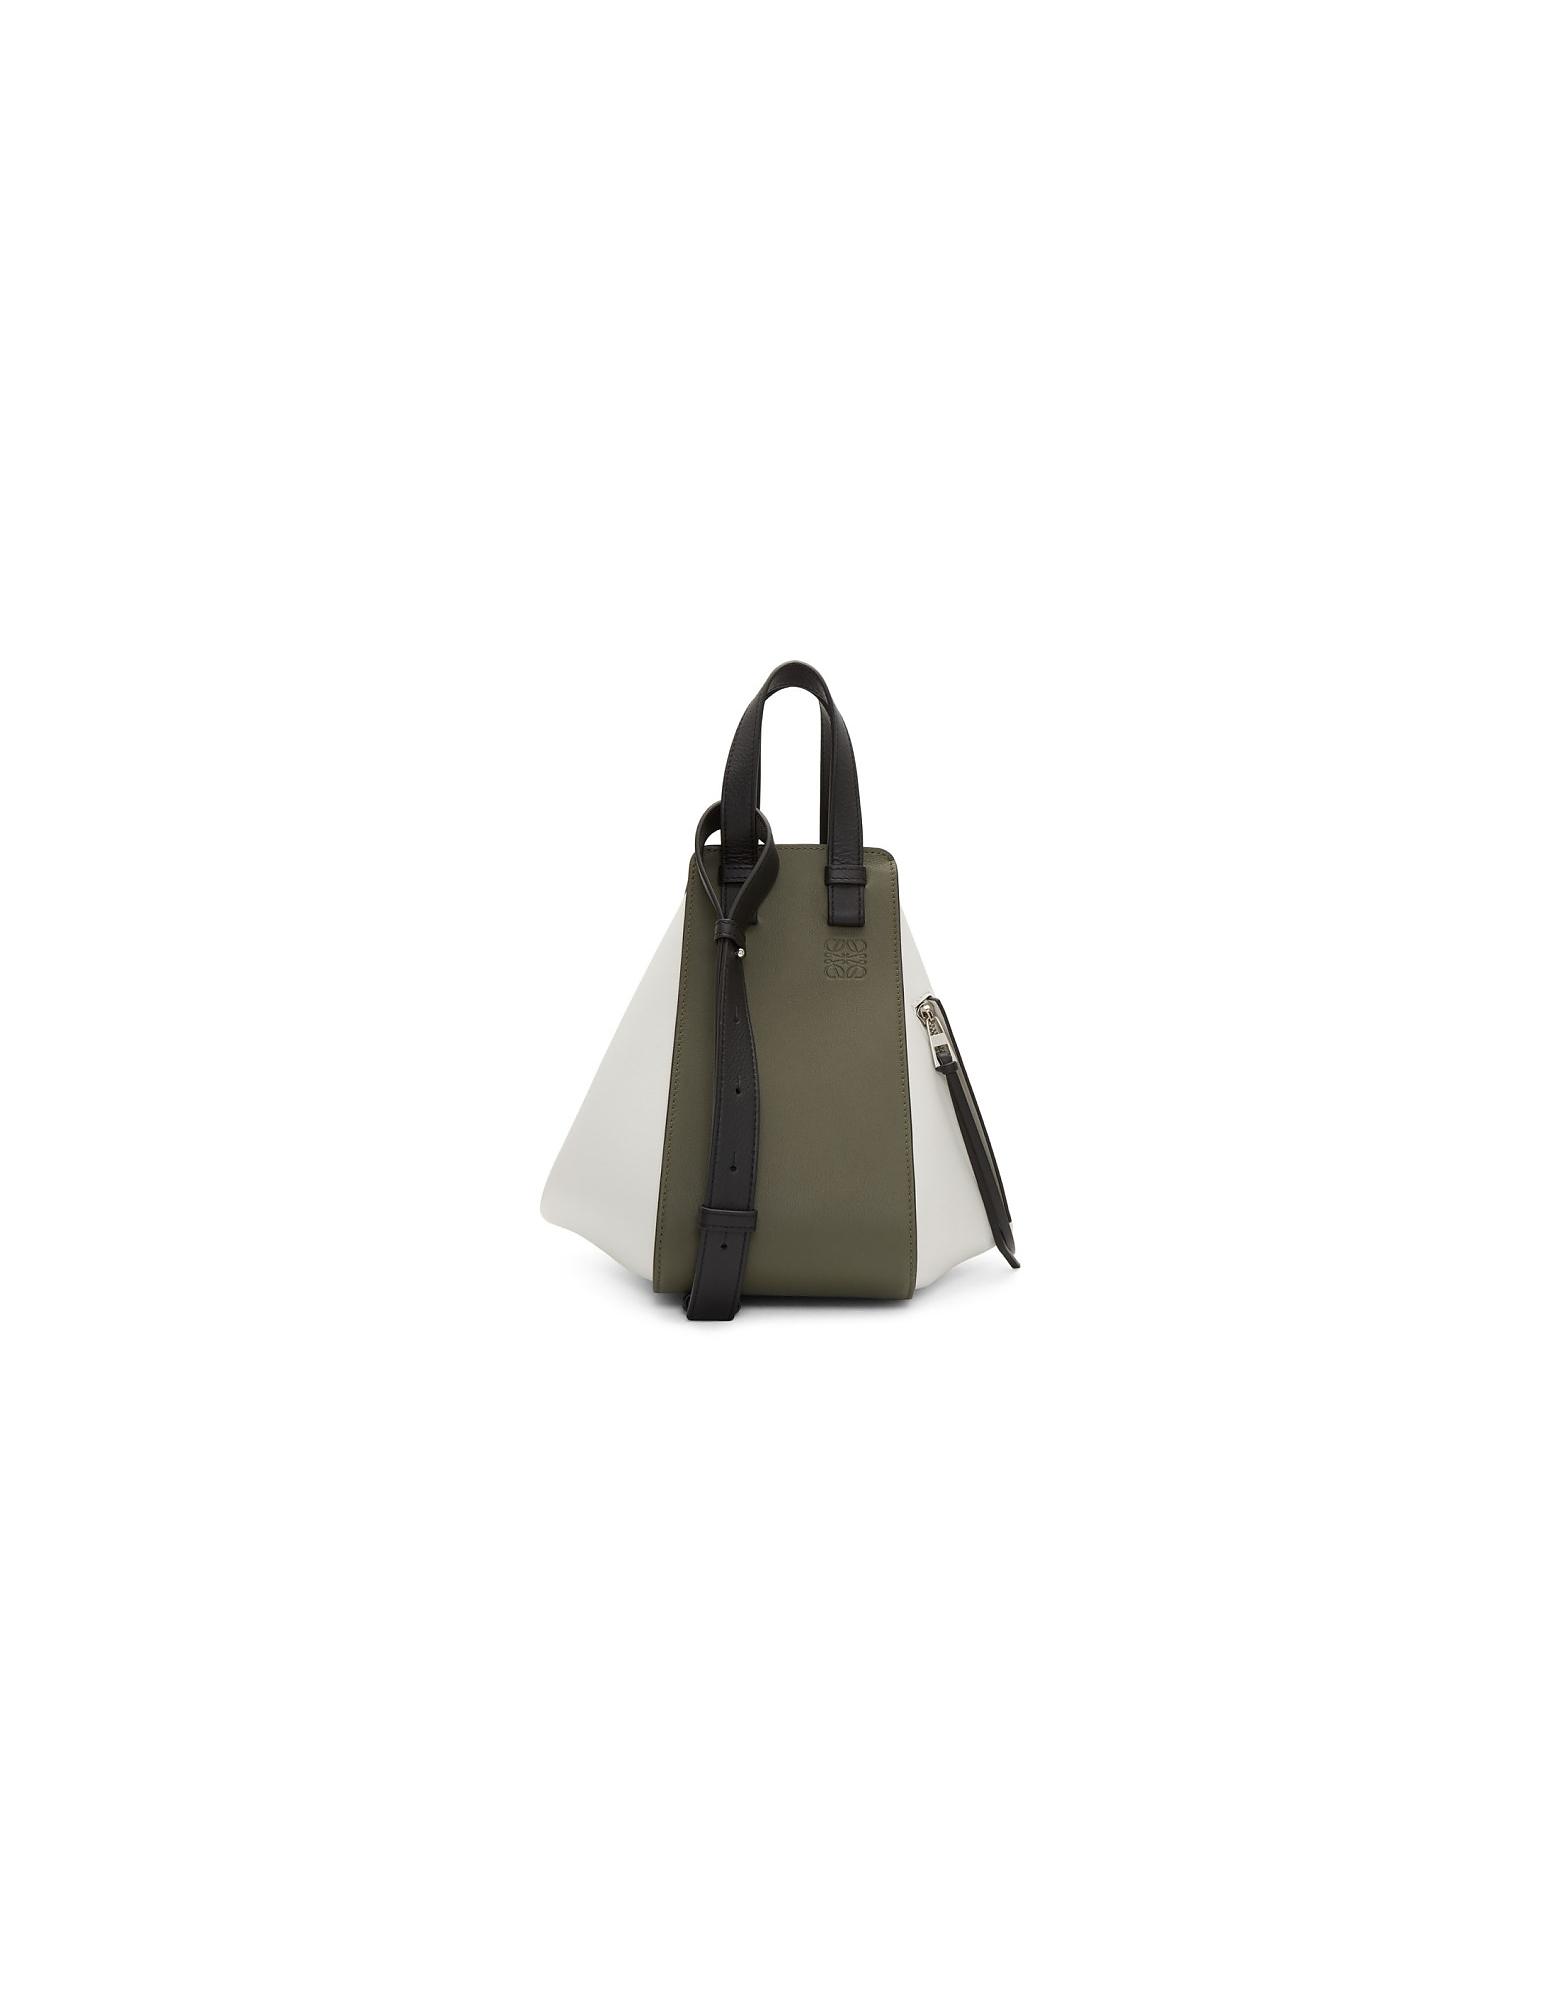 Loewe Designer Handbags, Green and White Small Hammock Bag